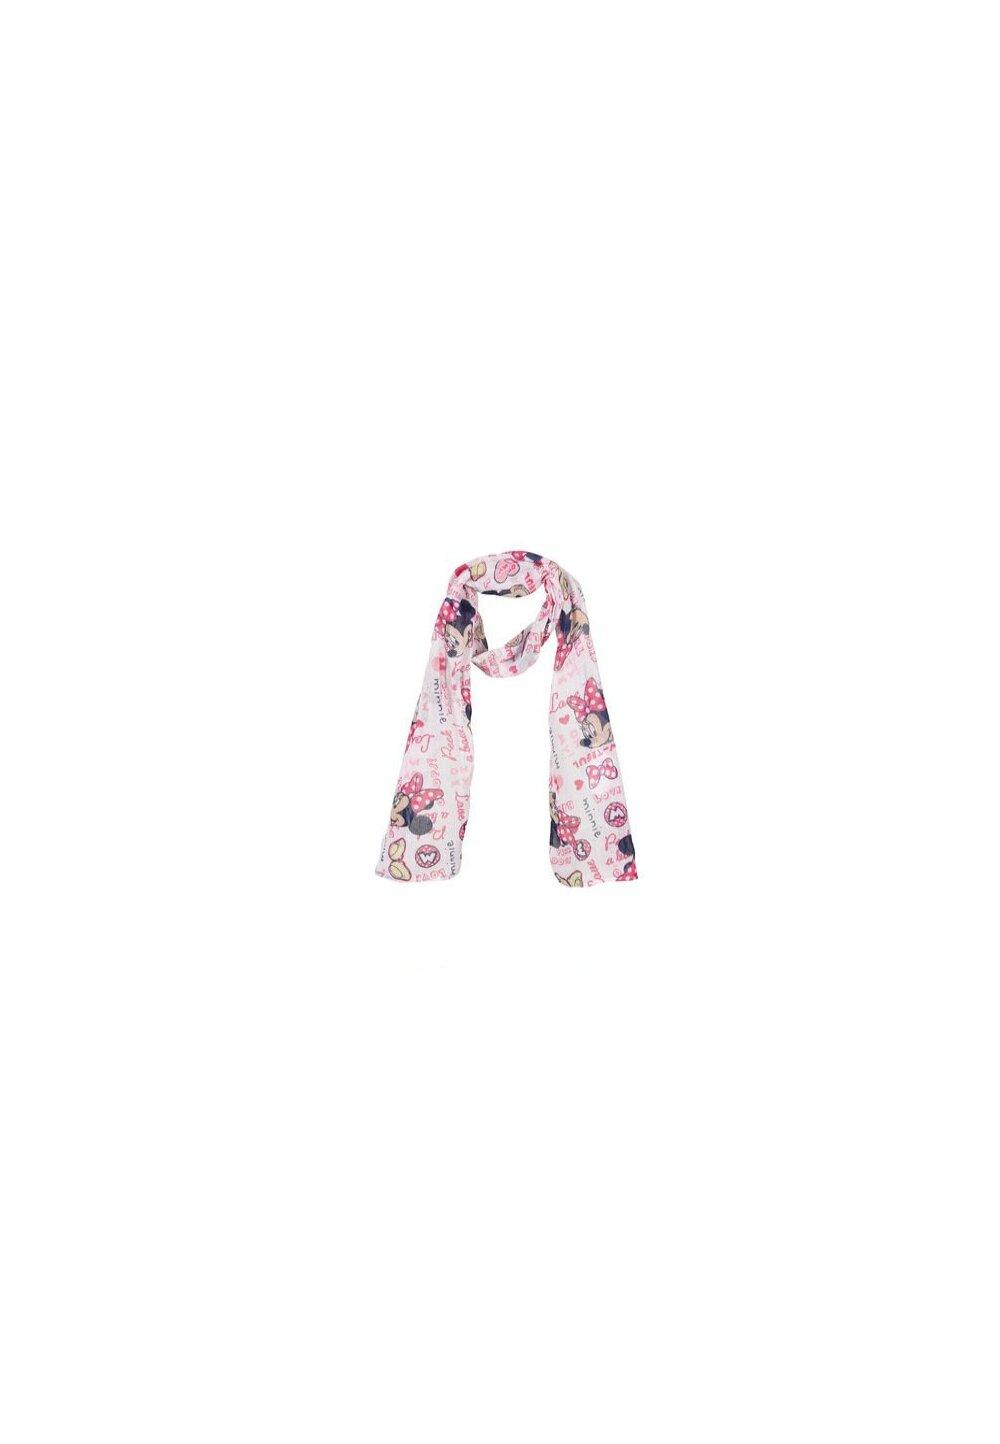 Esarfa, Love Minnie, alb cu roz imagine